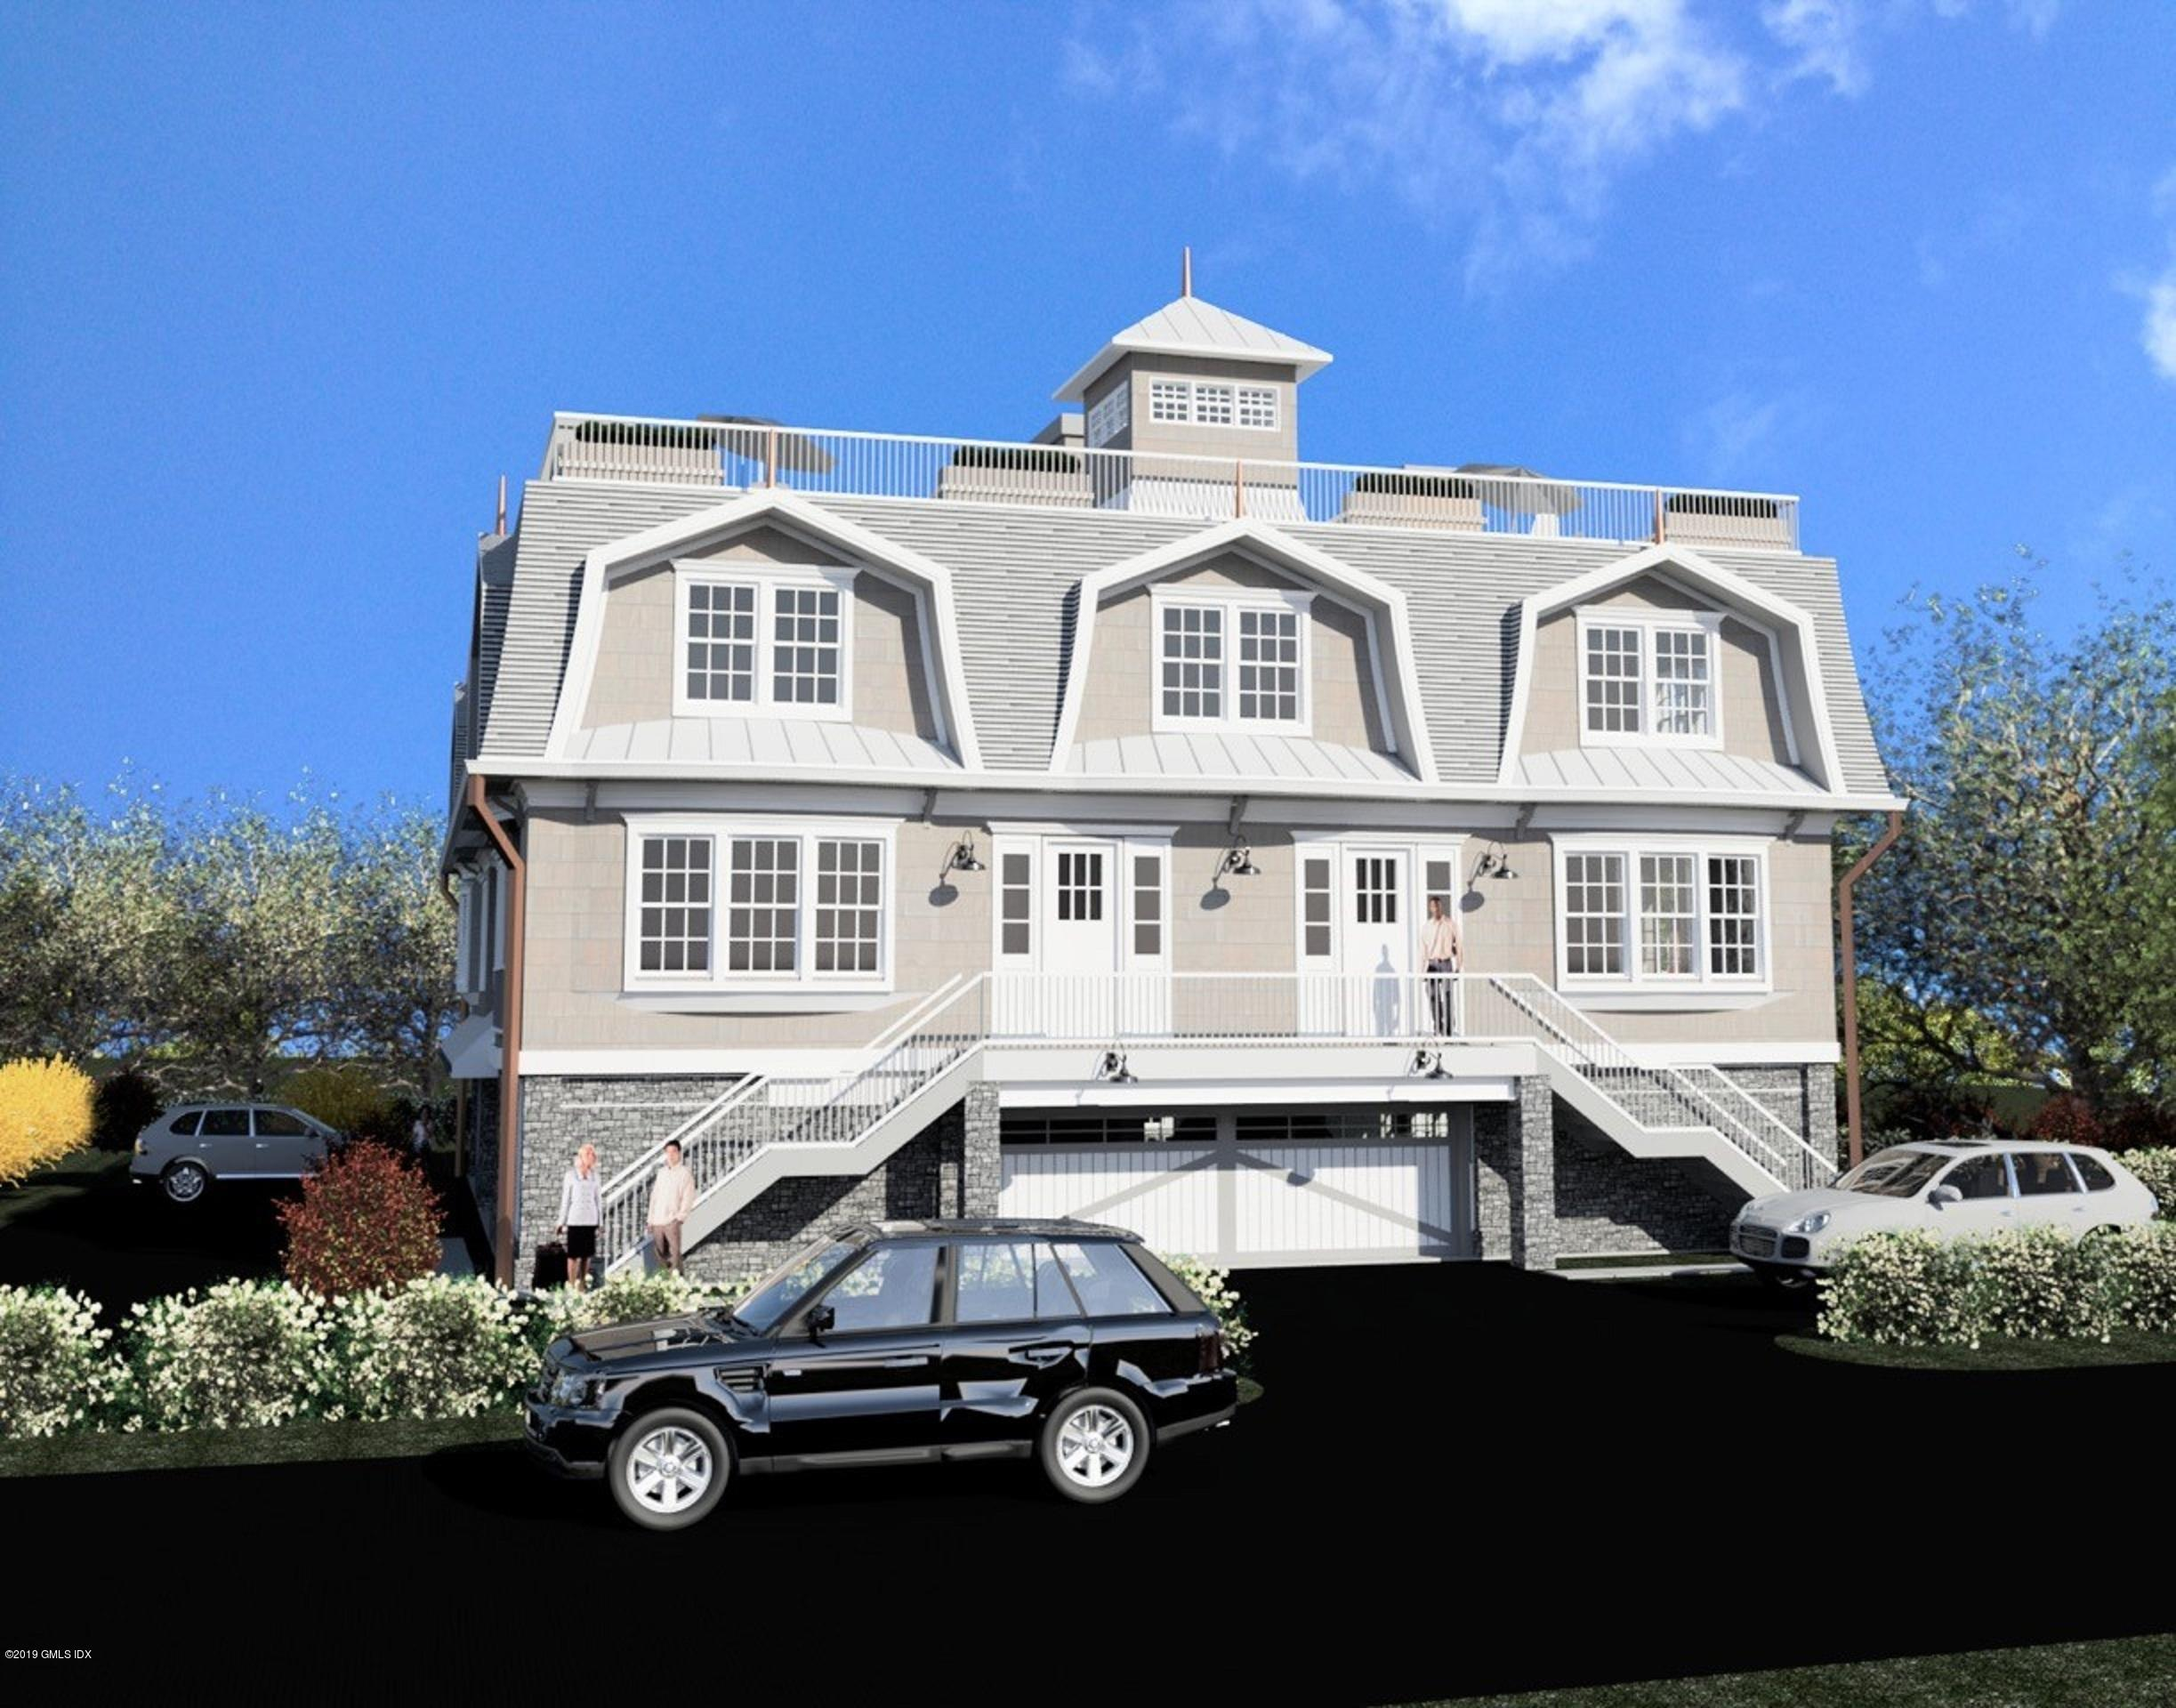 20 Idar Court,Greenwich,Connecticut 06830,3 Bedrooms Bedrooms,3 BathroomsBathrooms,Condominium,Idar,107869